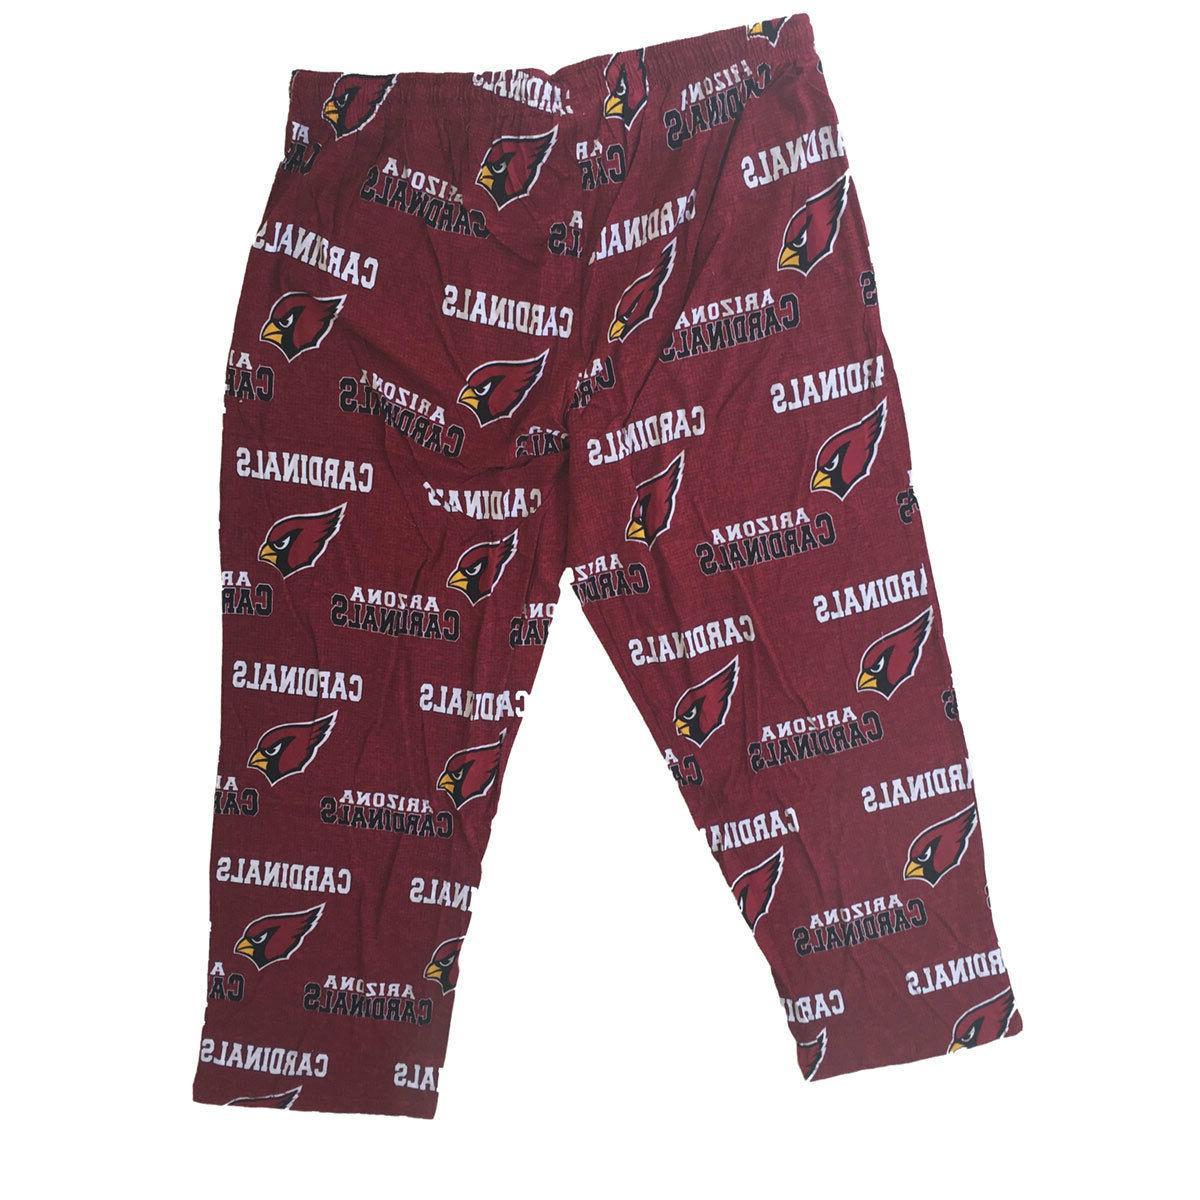 NFL Lounge Sleep Wear Pajama